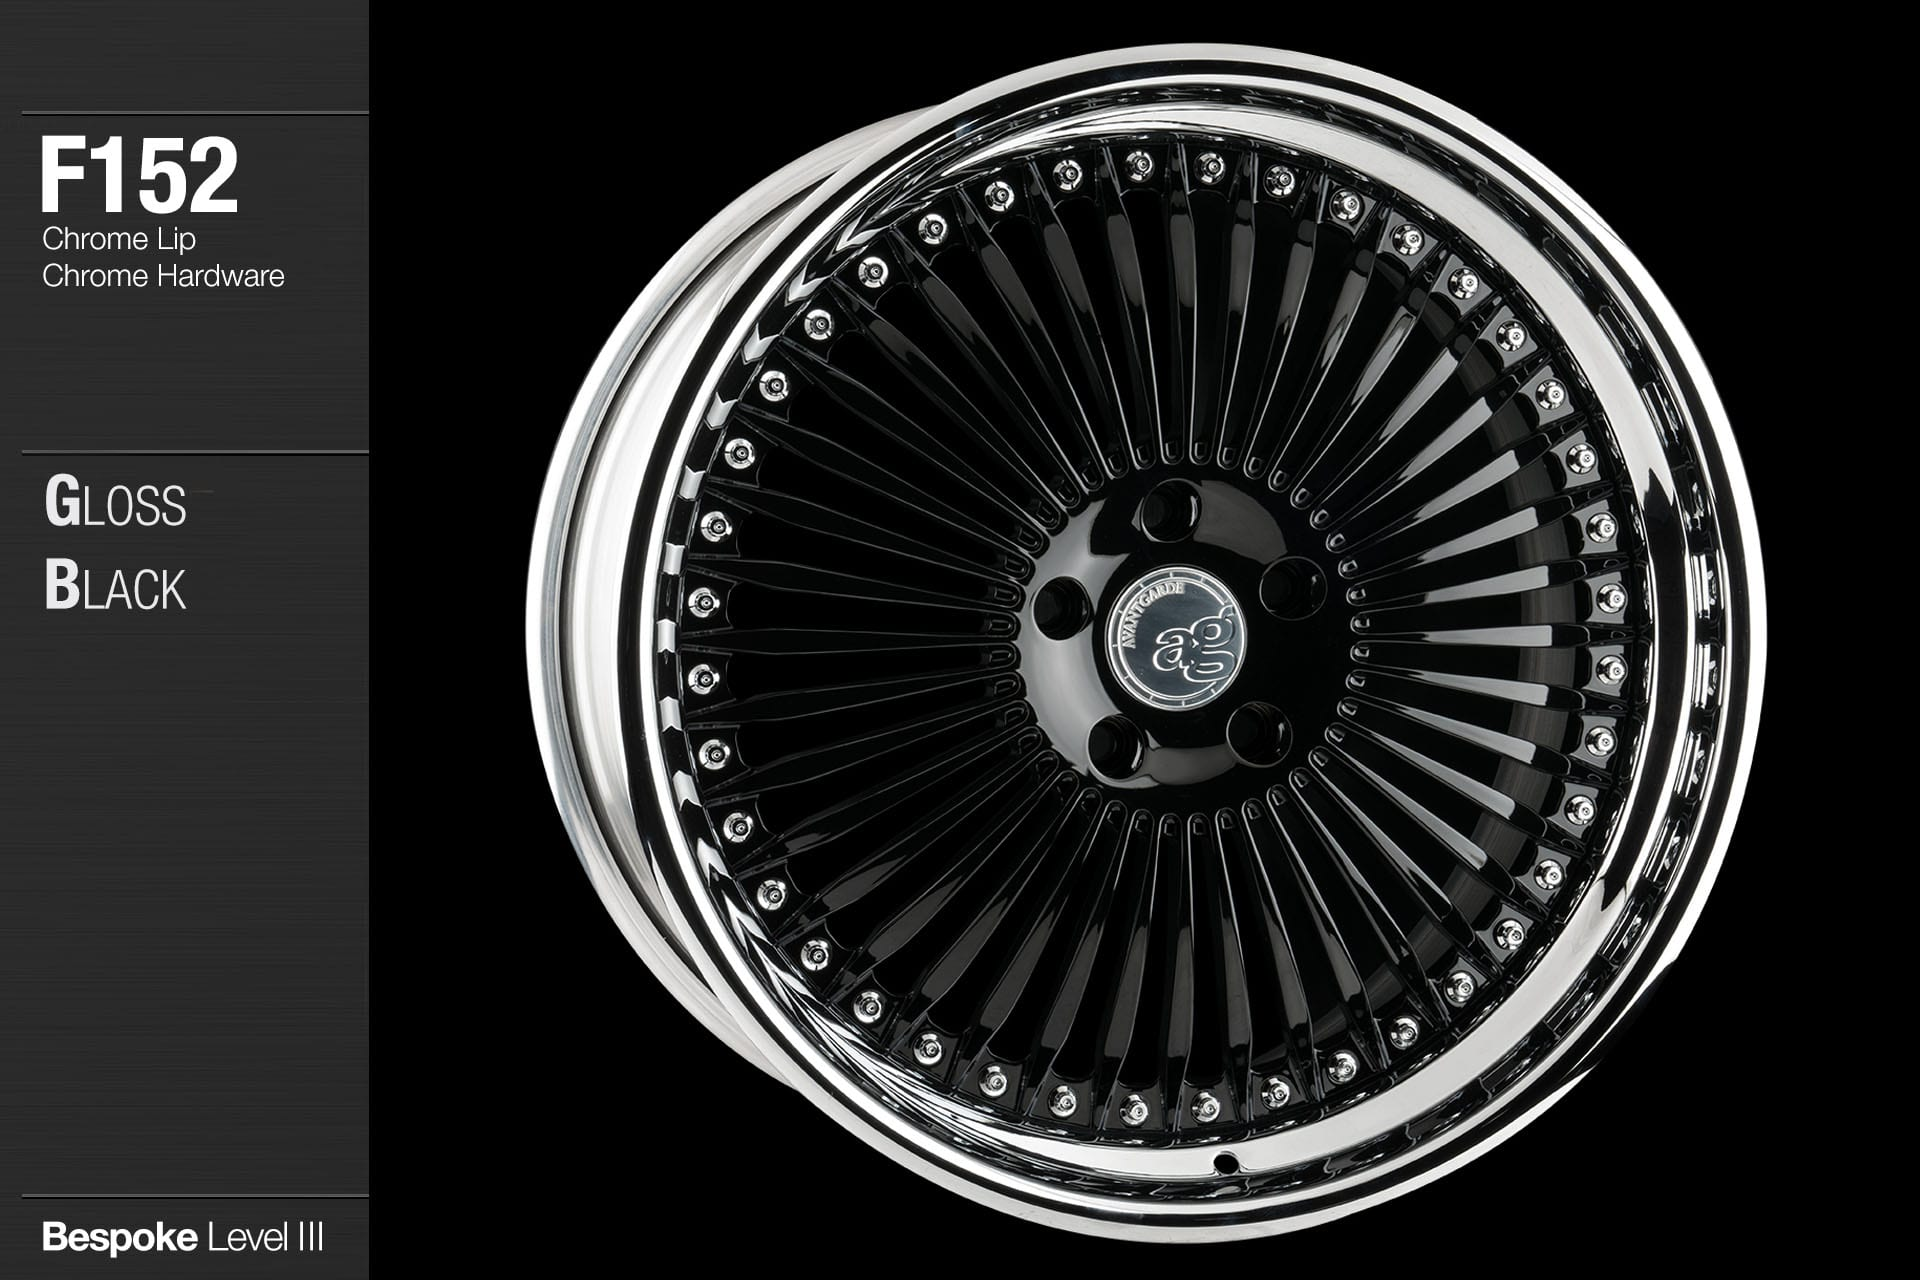 agwheels ag wheel wheels avant garde f152 gloss black chrome lip hardware forged wheels forge 3piece 3 piece 19inch 20inch